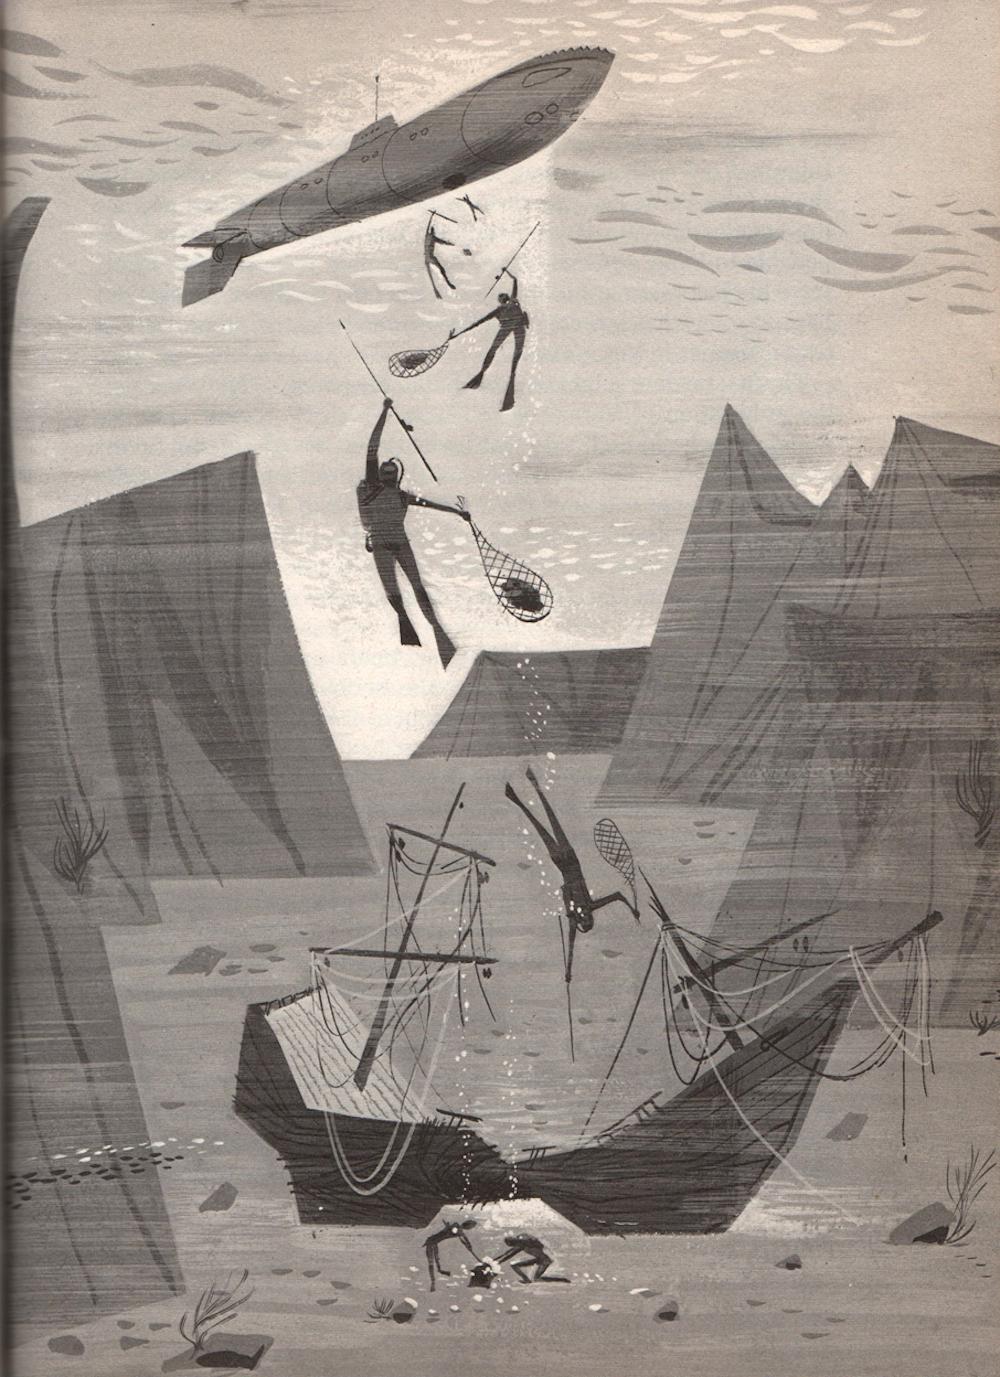 Пласенсиа, иллюстрации к Жюль Верну 2.jpg